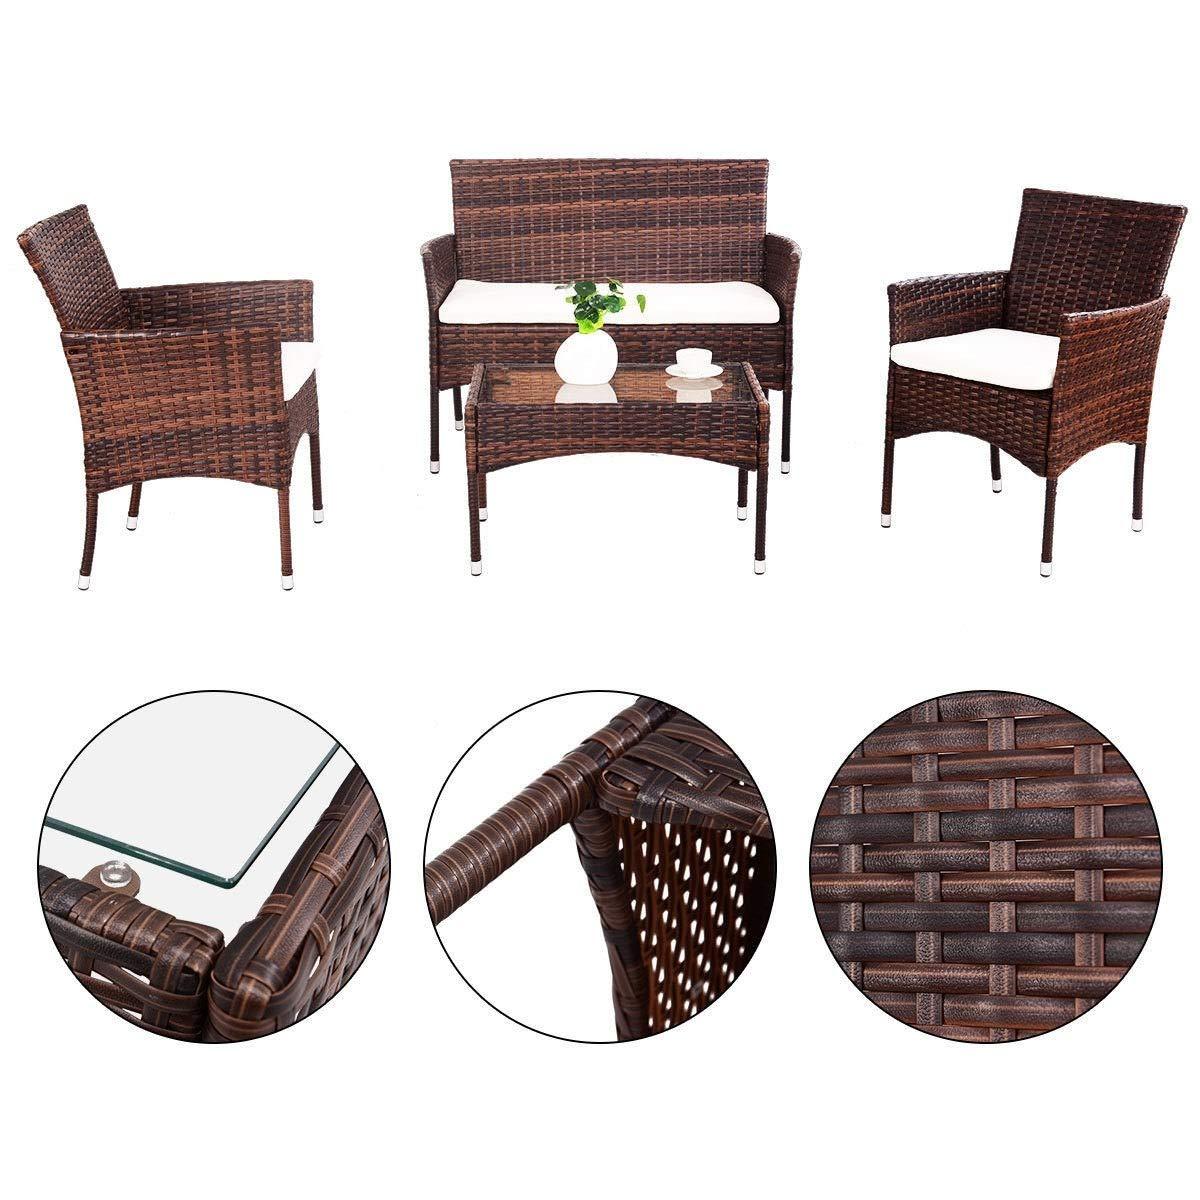 EnjoyShop 4 Pcs PE Rattan Wicker Table Shelf Sofa Furniture Set with Cushion Dining Garden Picnic Outdoor by EnjoyShop (Image #5)